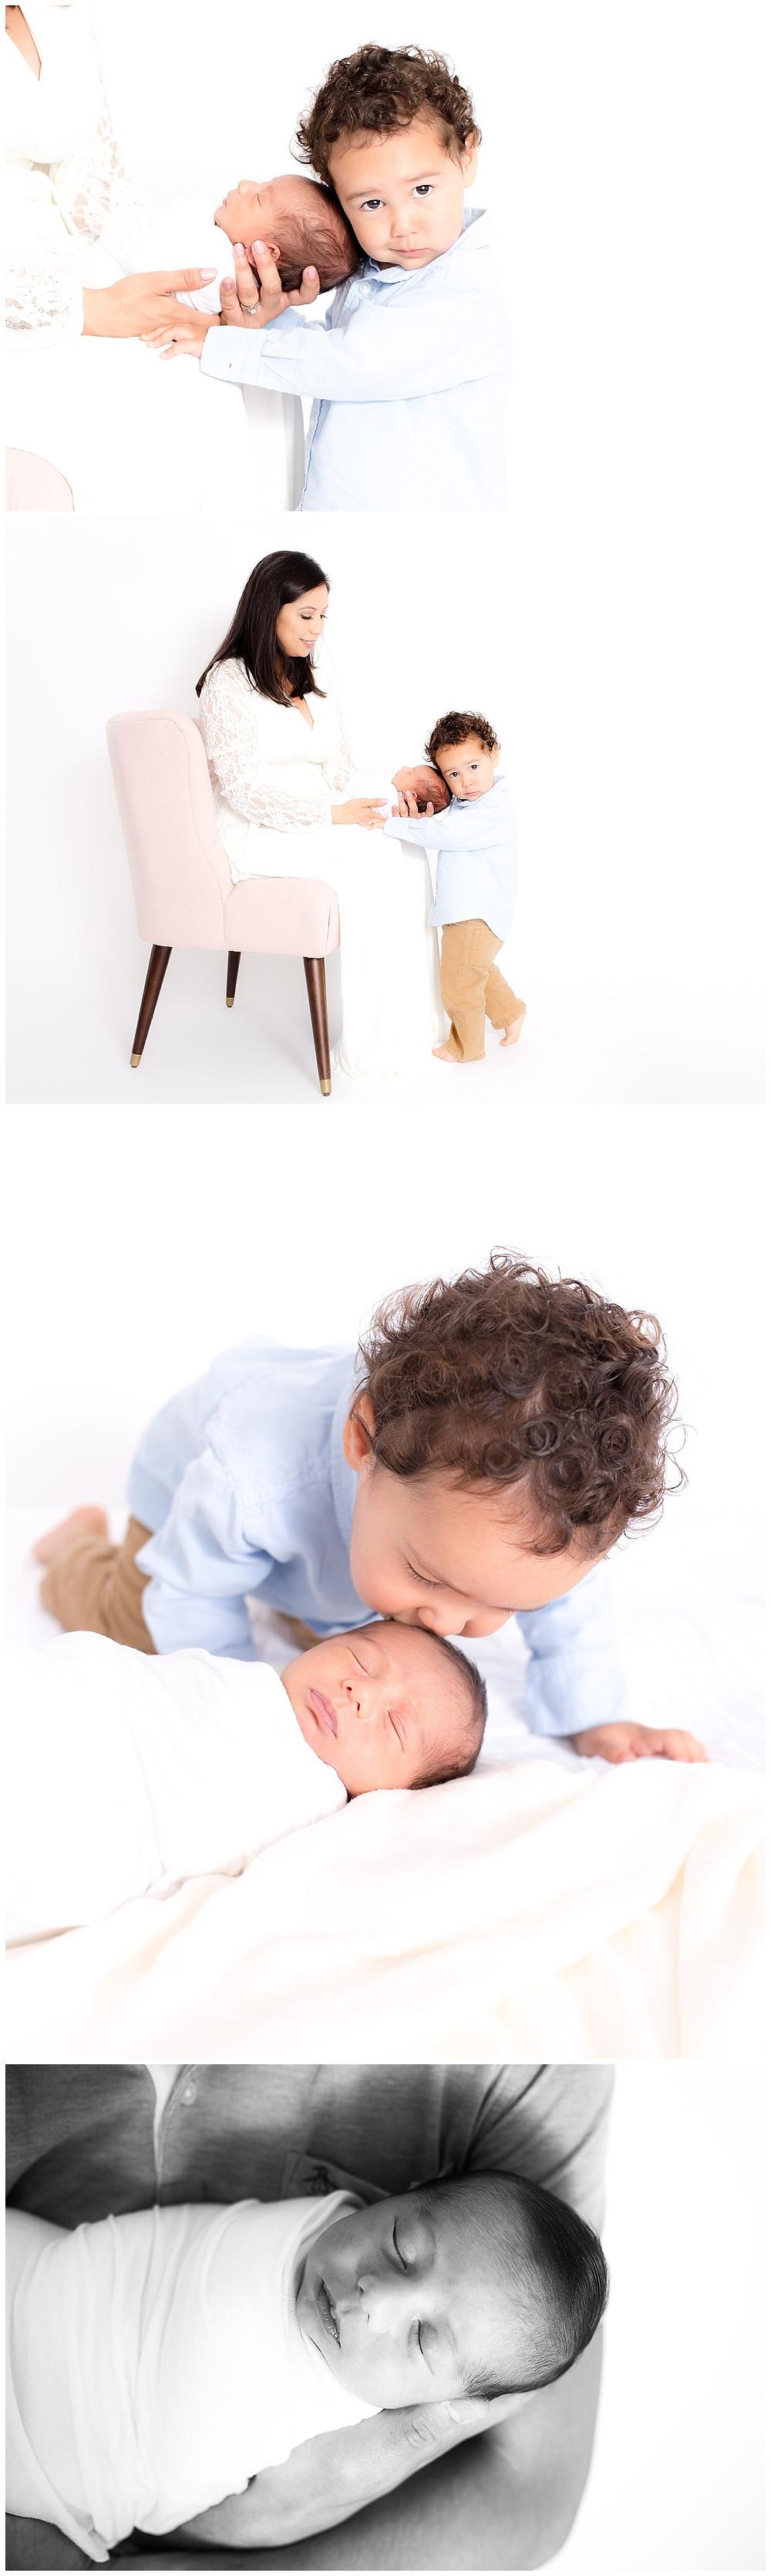 newborn photography in Dallas studio, natural newborn posing